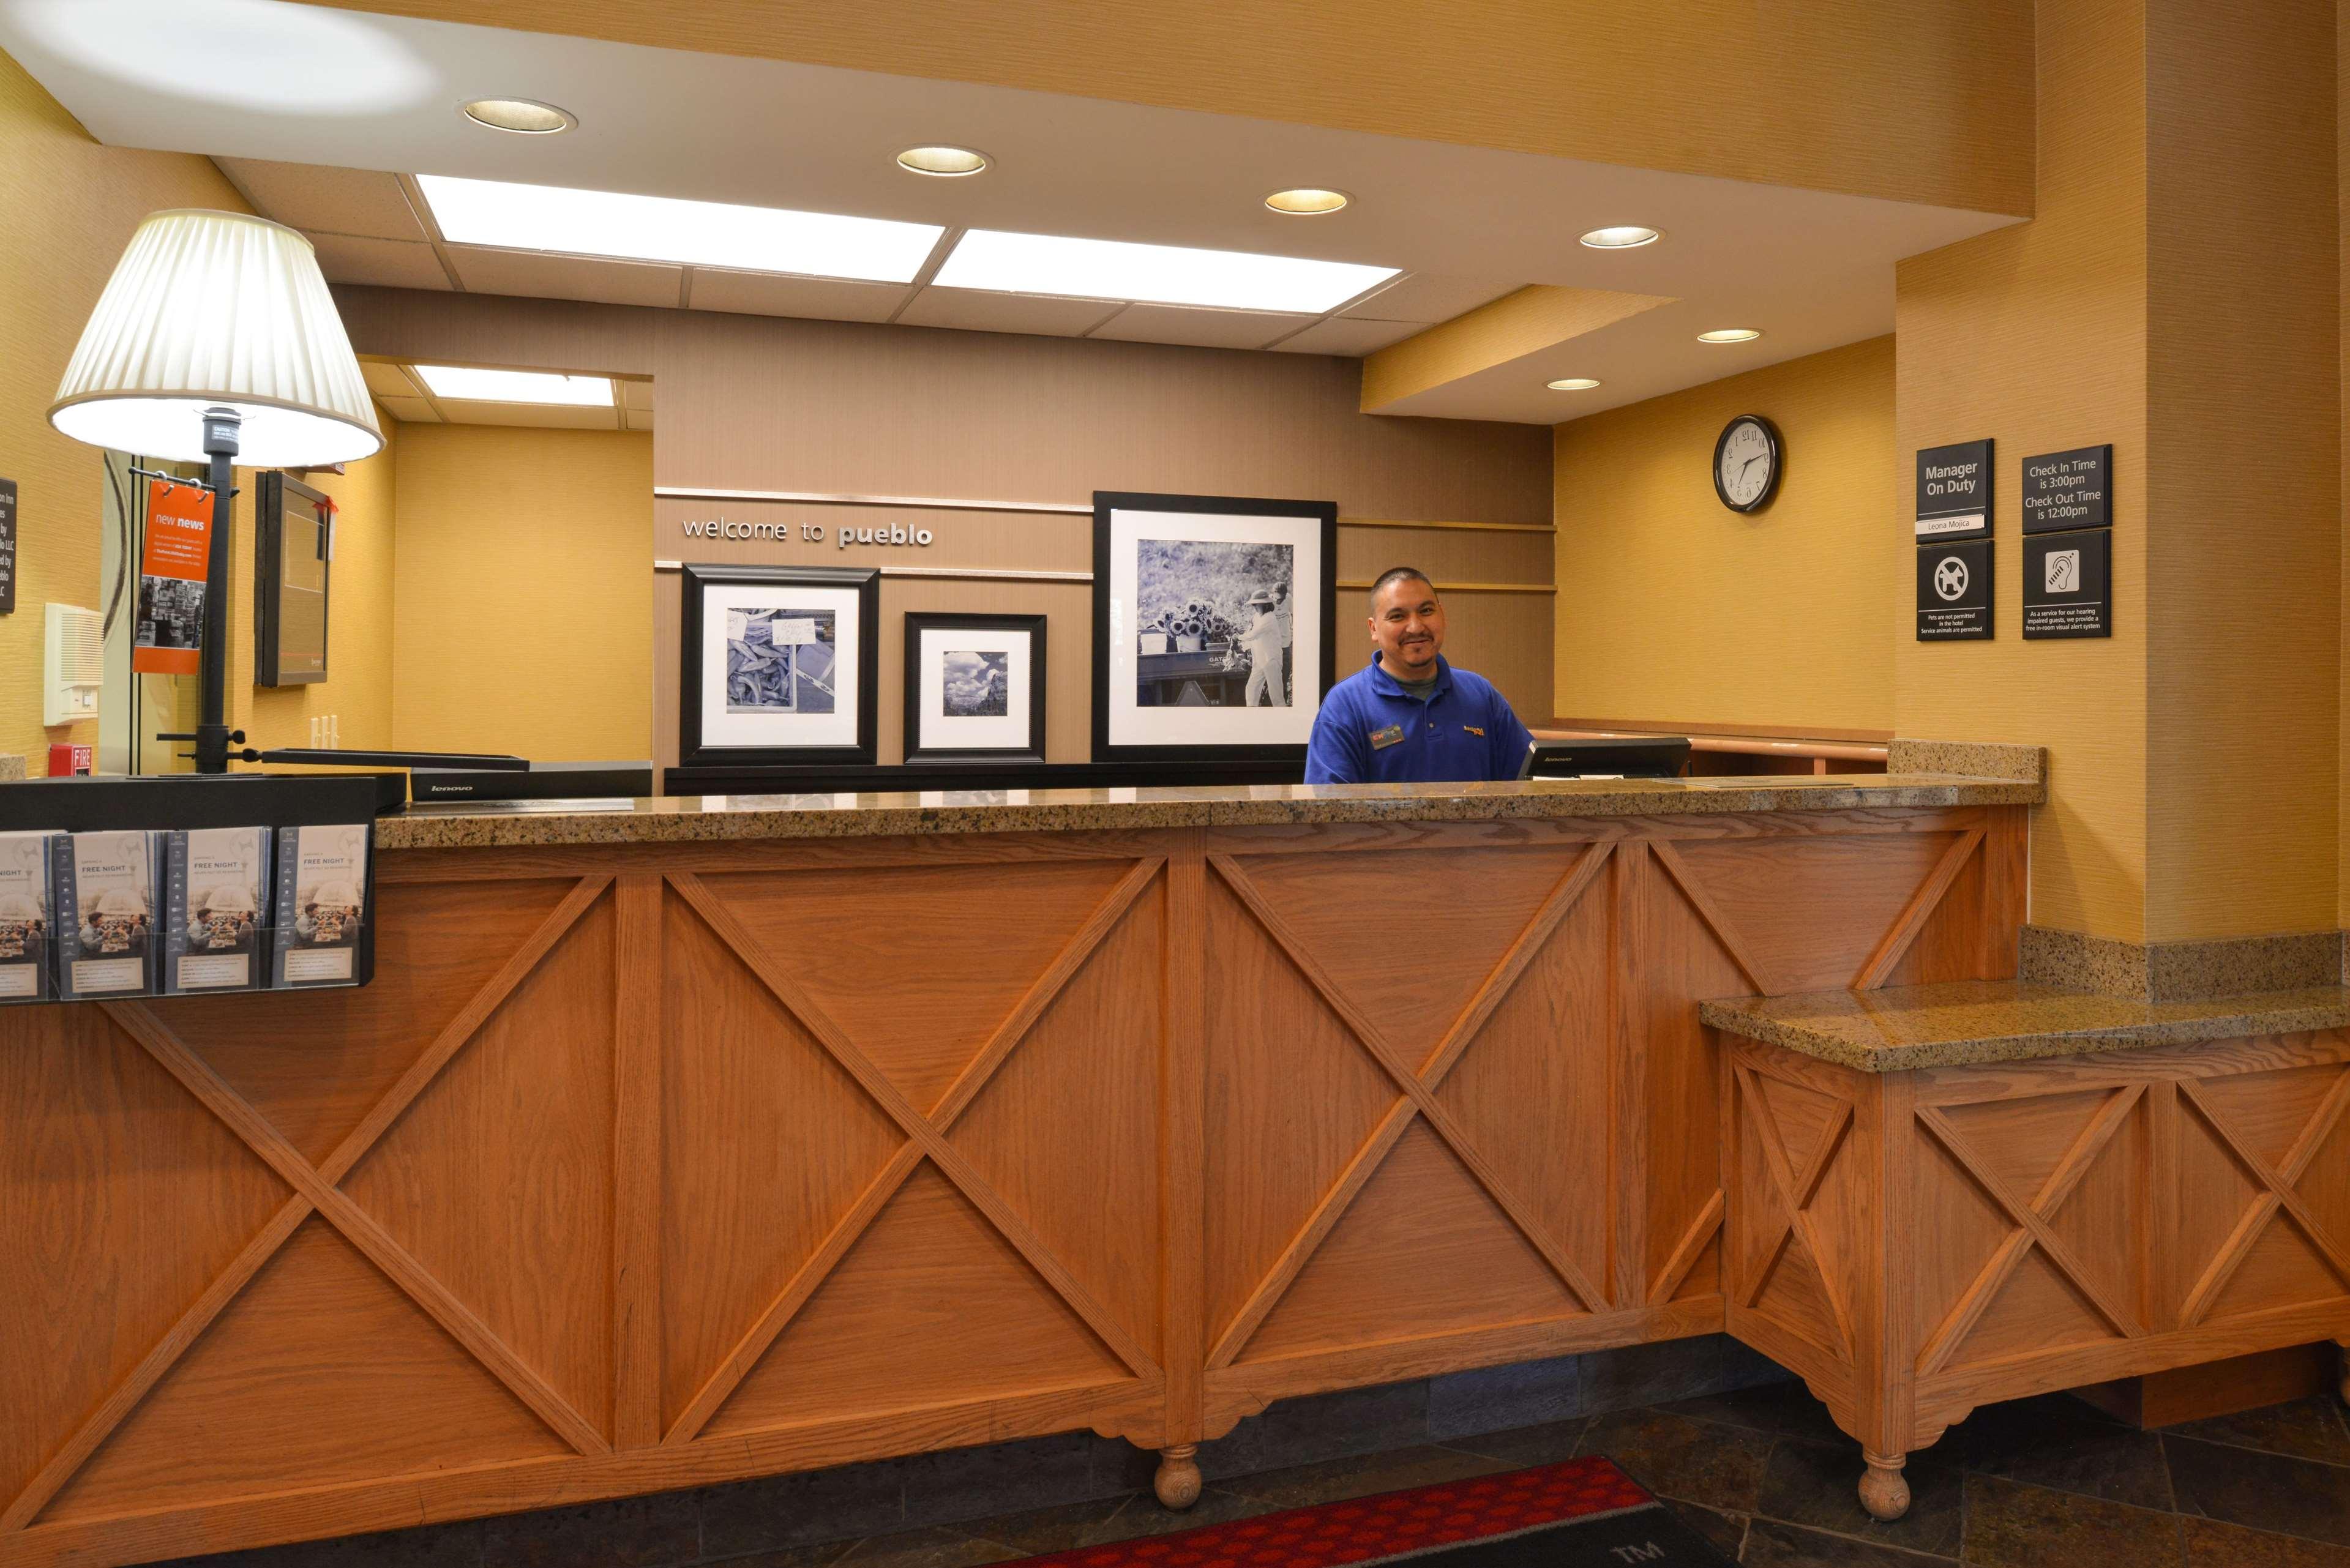 Hampton Inn & Suites Pueblo-Southgate image 2